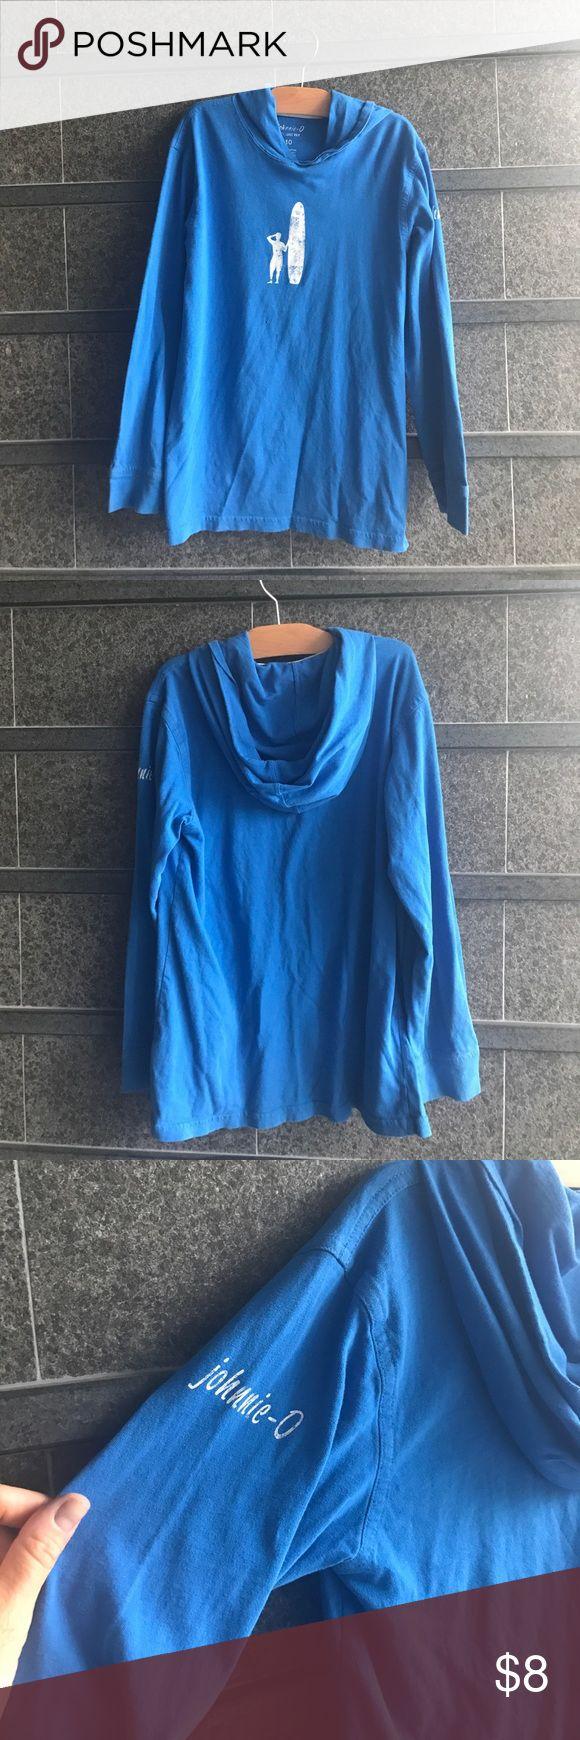 "Johnnie-O hooded tee Boys (or girls!) Johnnie-O ""West Coast Prep"" hooded long sleeve tee. Relaxed casual style from Johnnie-O! johnnie-O Shirts & Tops Sweatshirts & Hoodies"